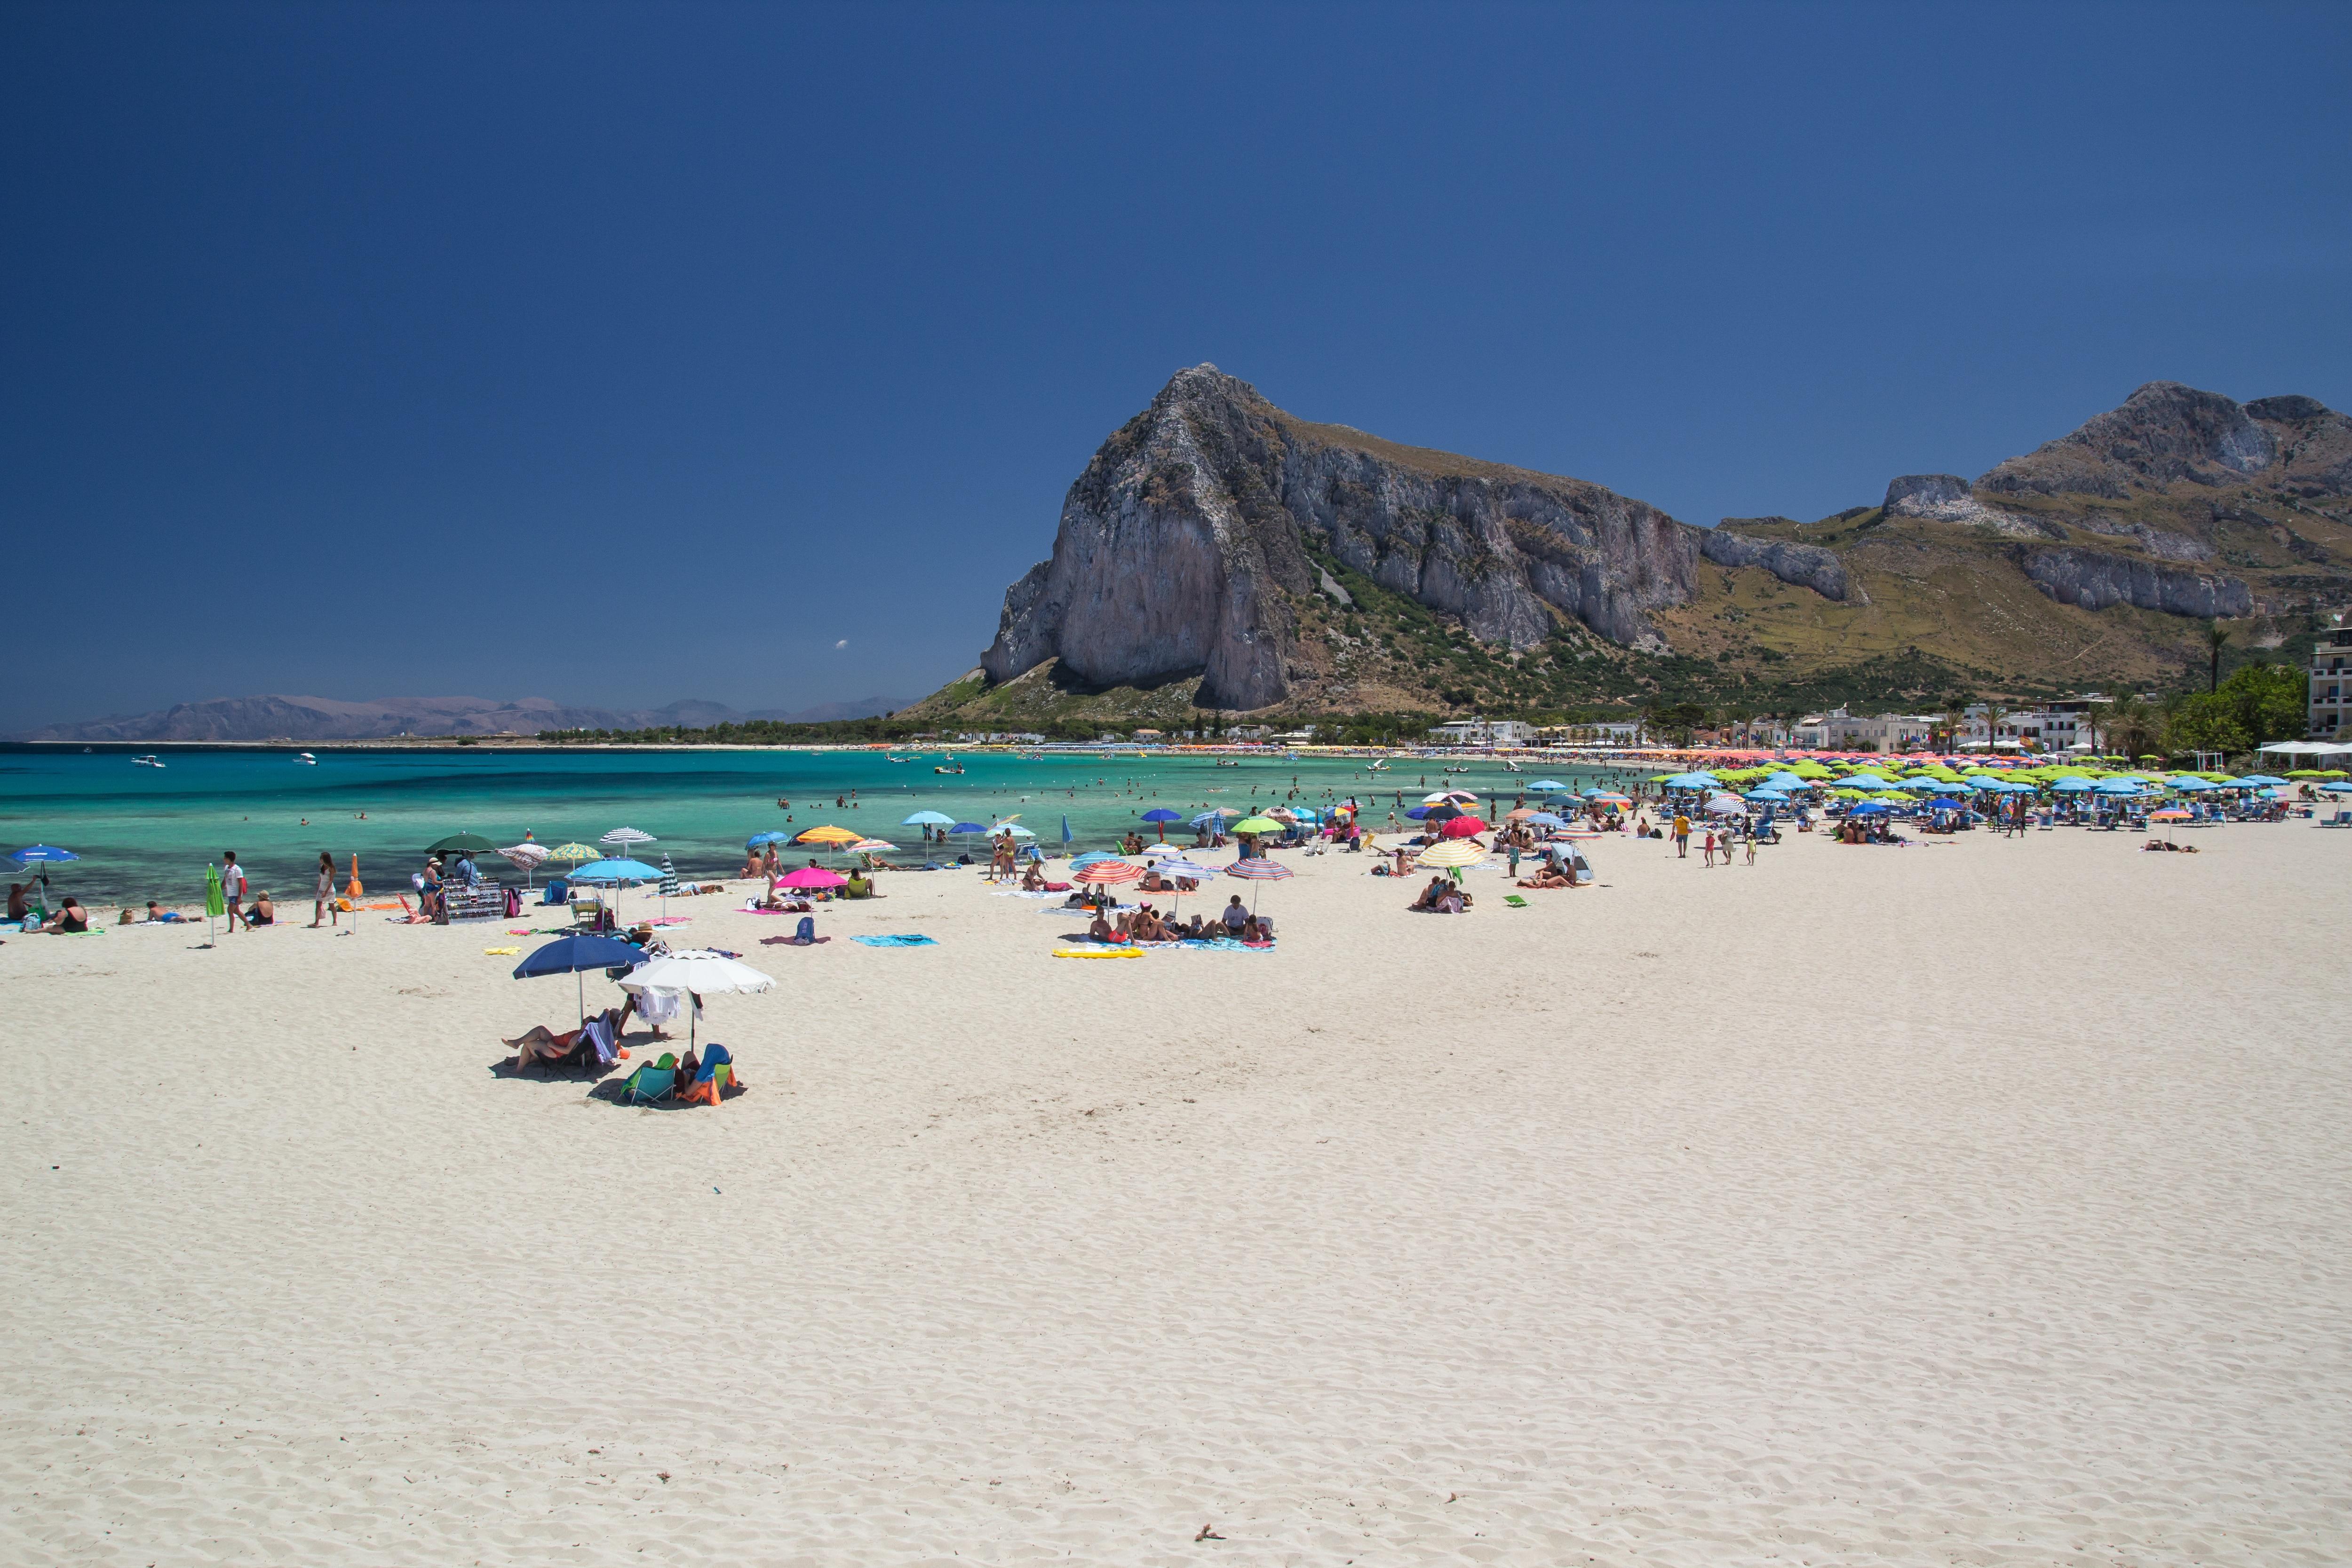 San Vito Lo Capo, Italy